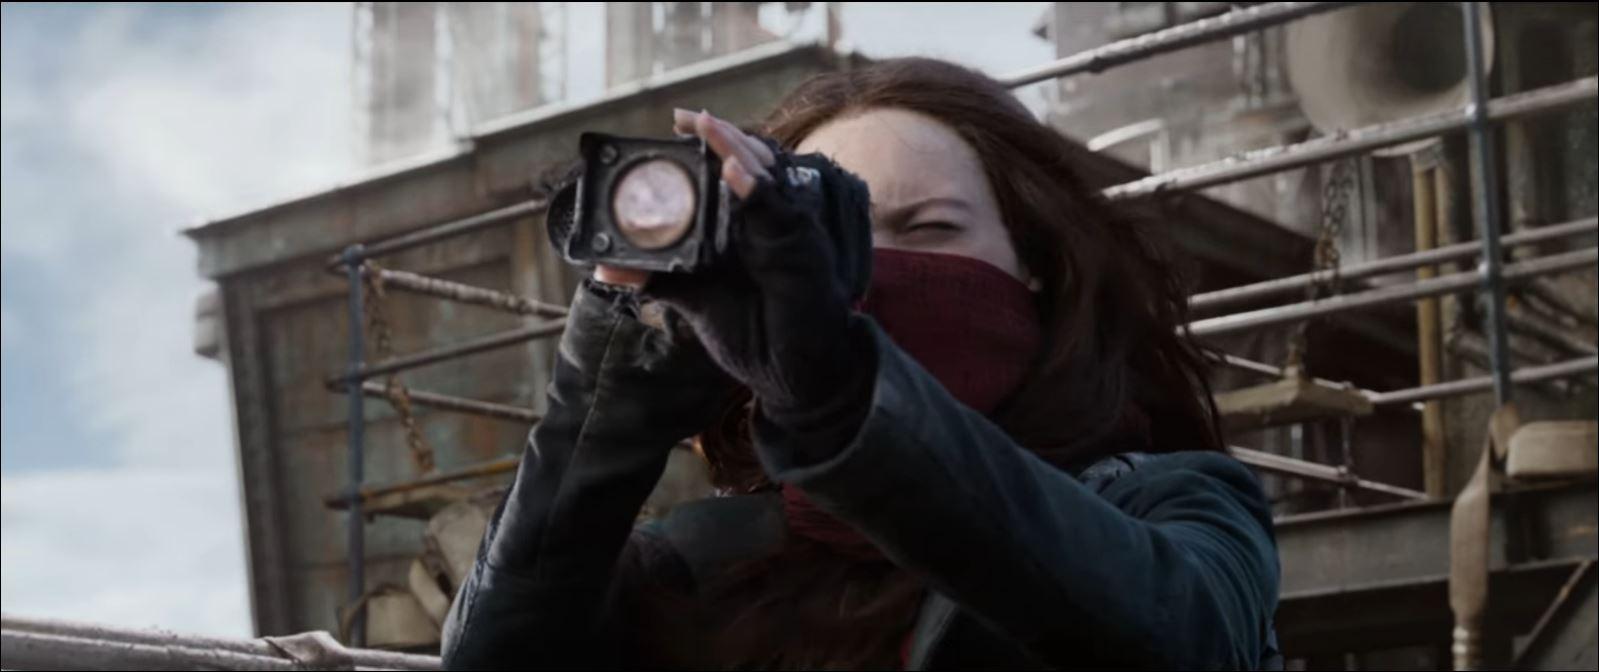 Hera Hilmar in Mortal Engines (2018)